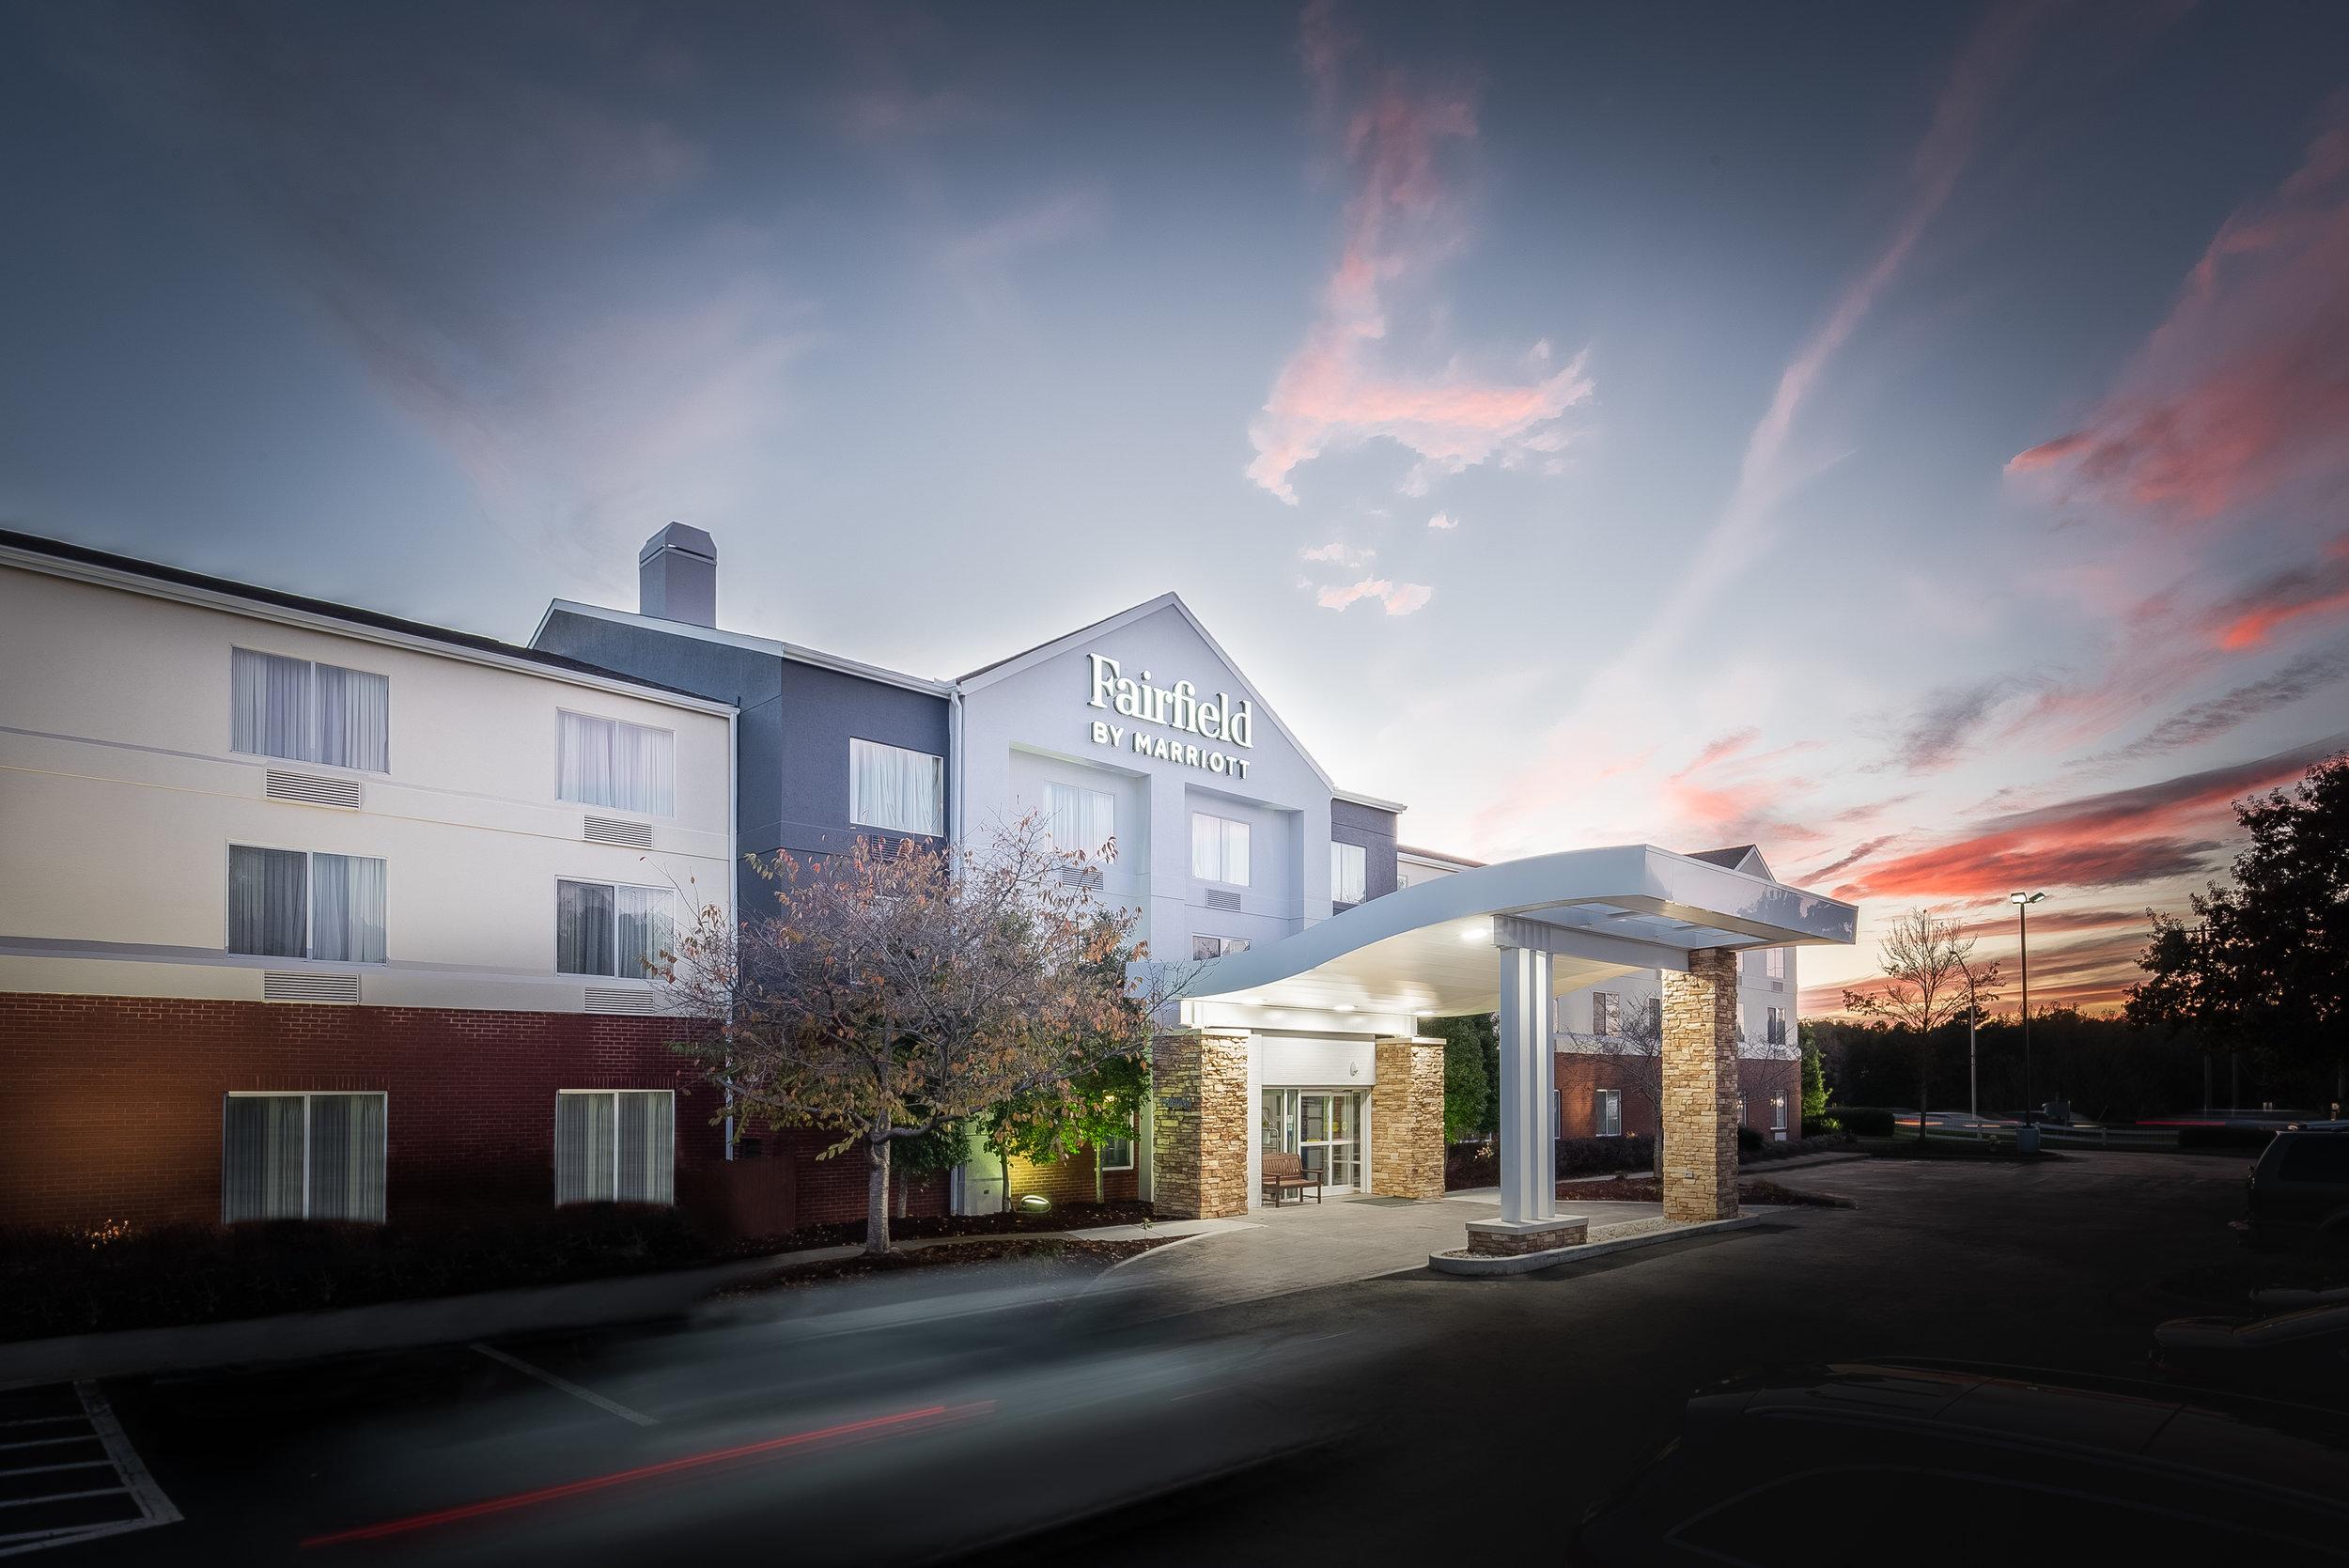 Fairfield Inn by Marriott Charlotte Northlake